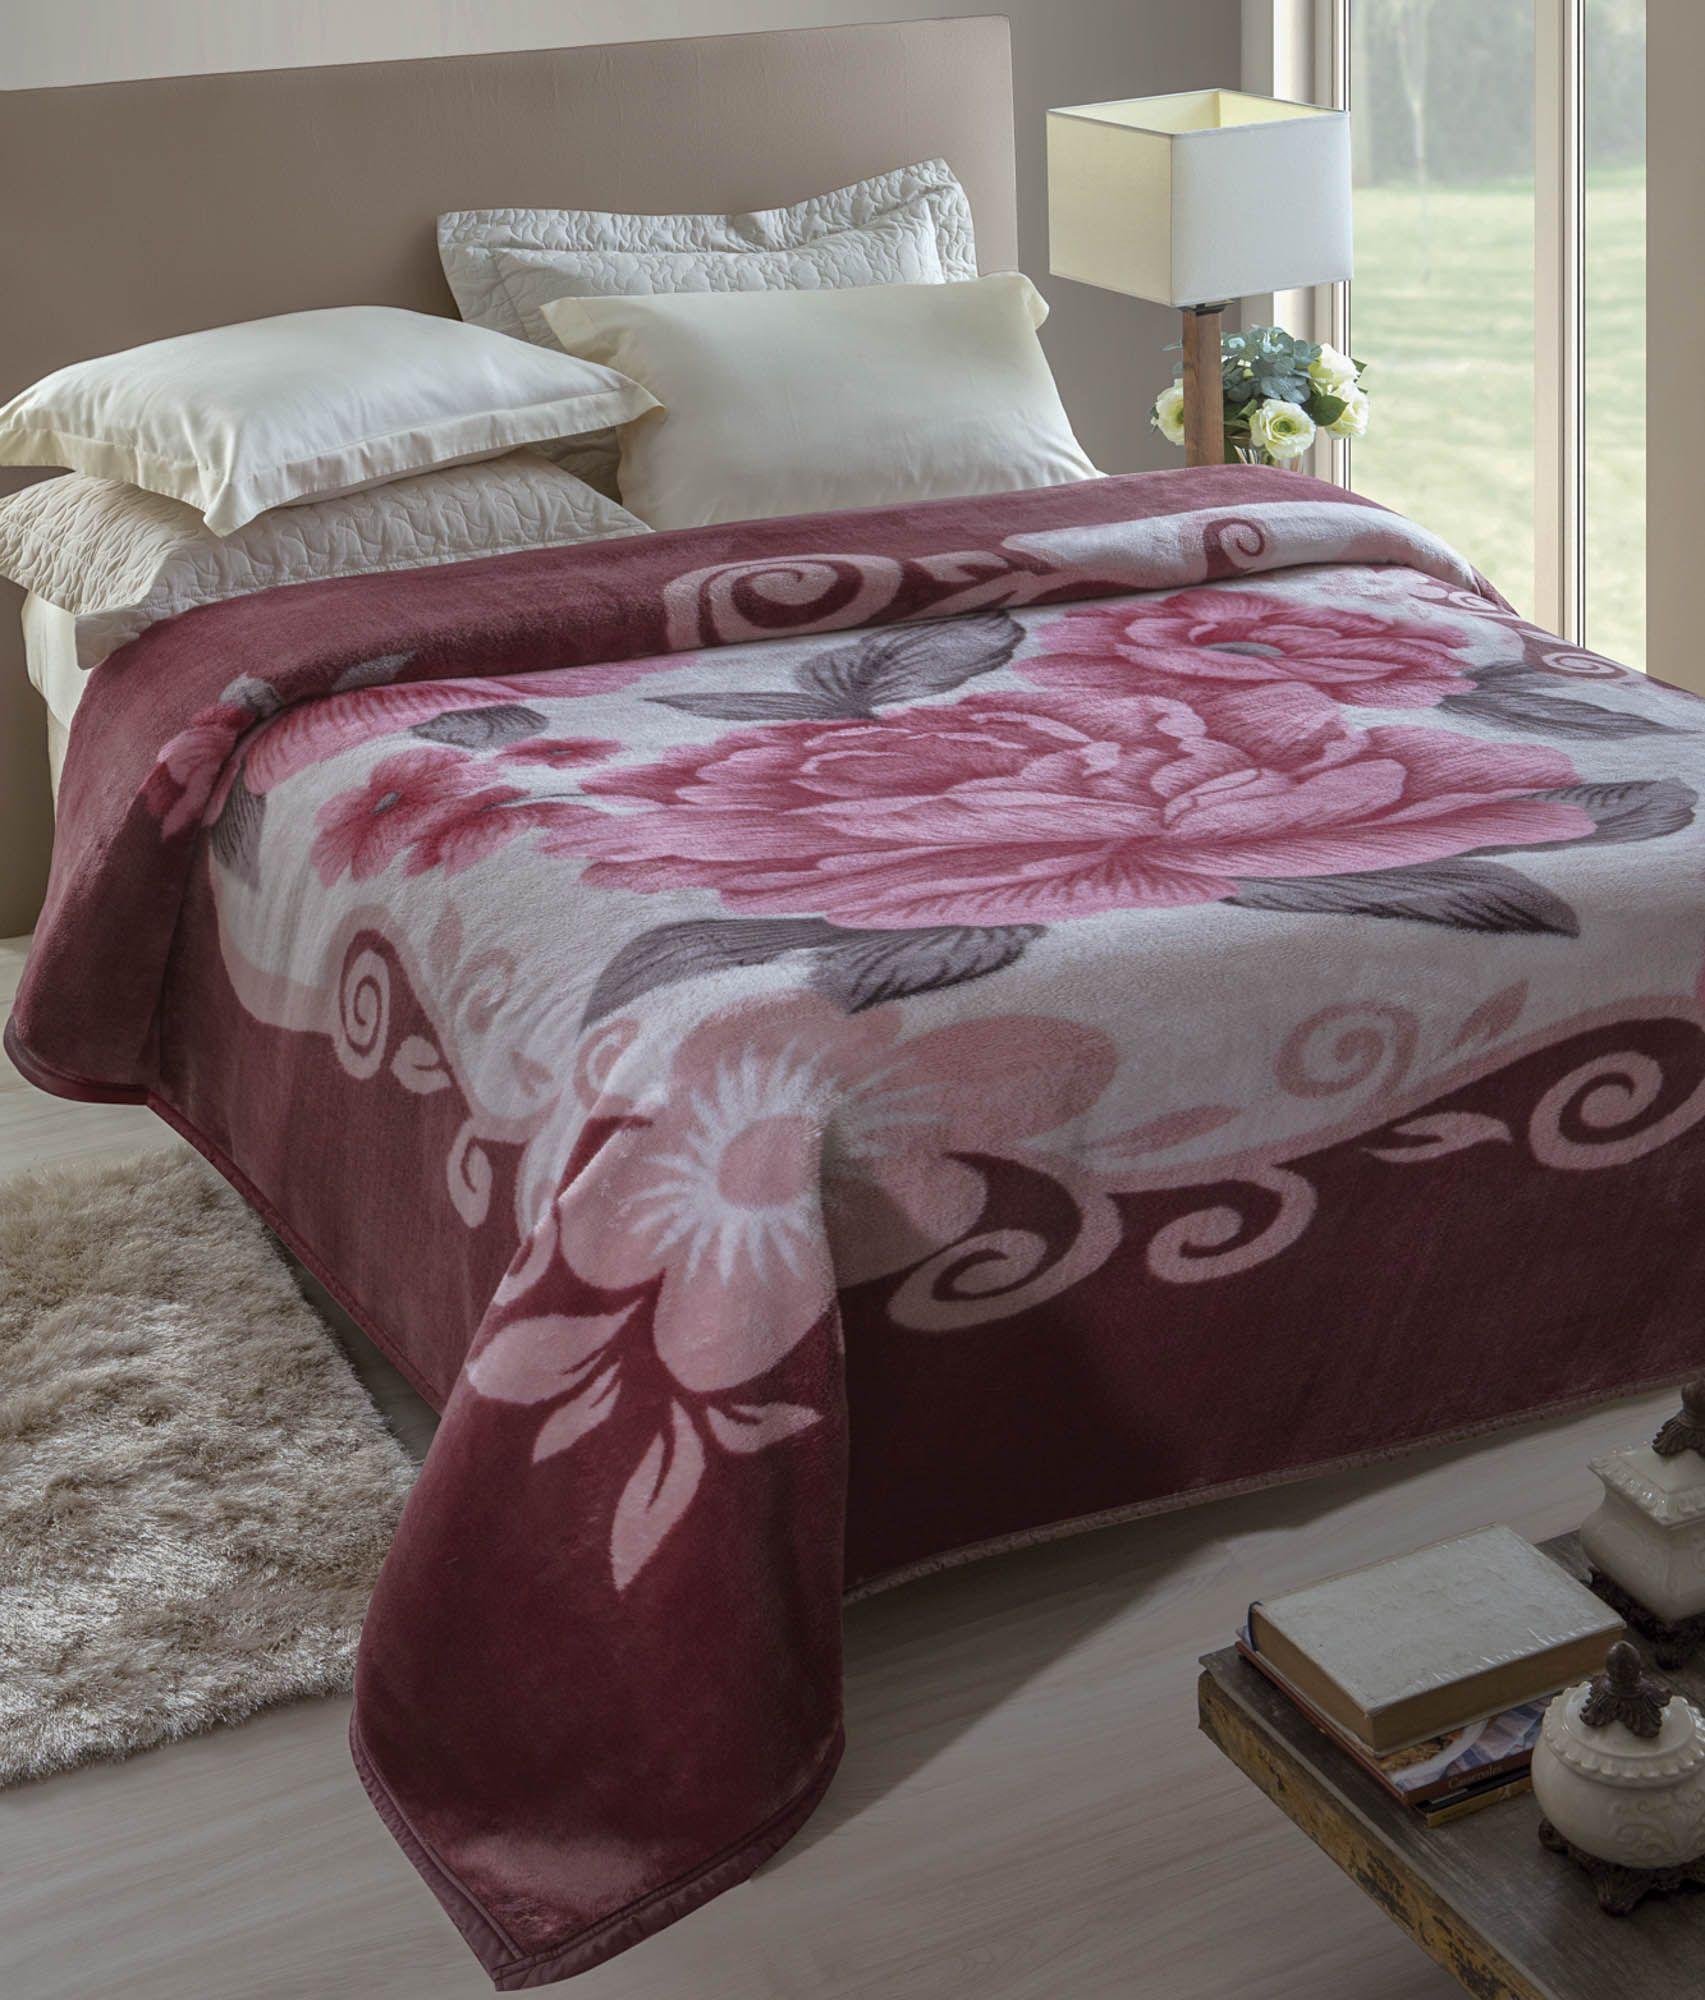 Cobertor Microfibra Jolitex Araneda Kyor Plus King 2,20 m x 2,40 m